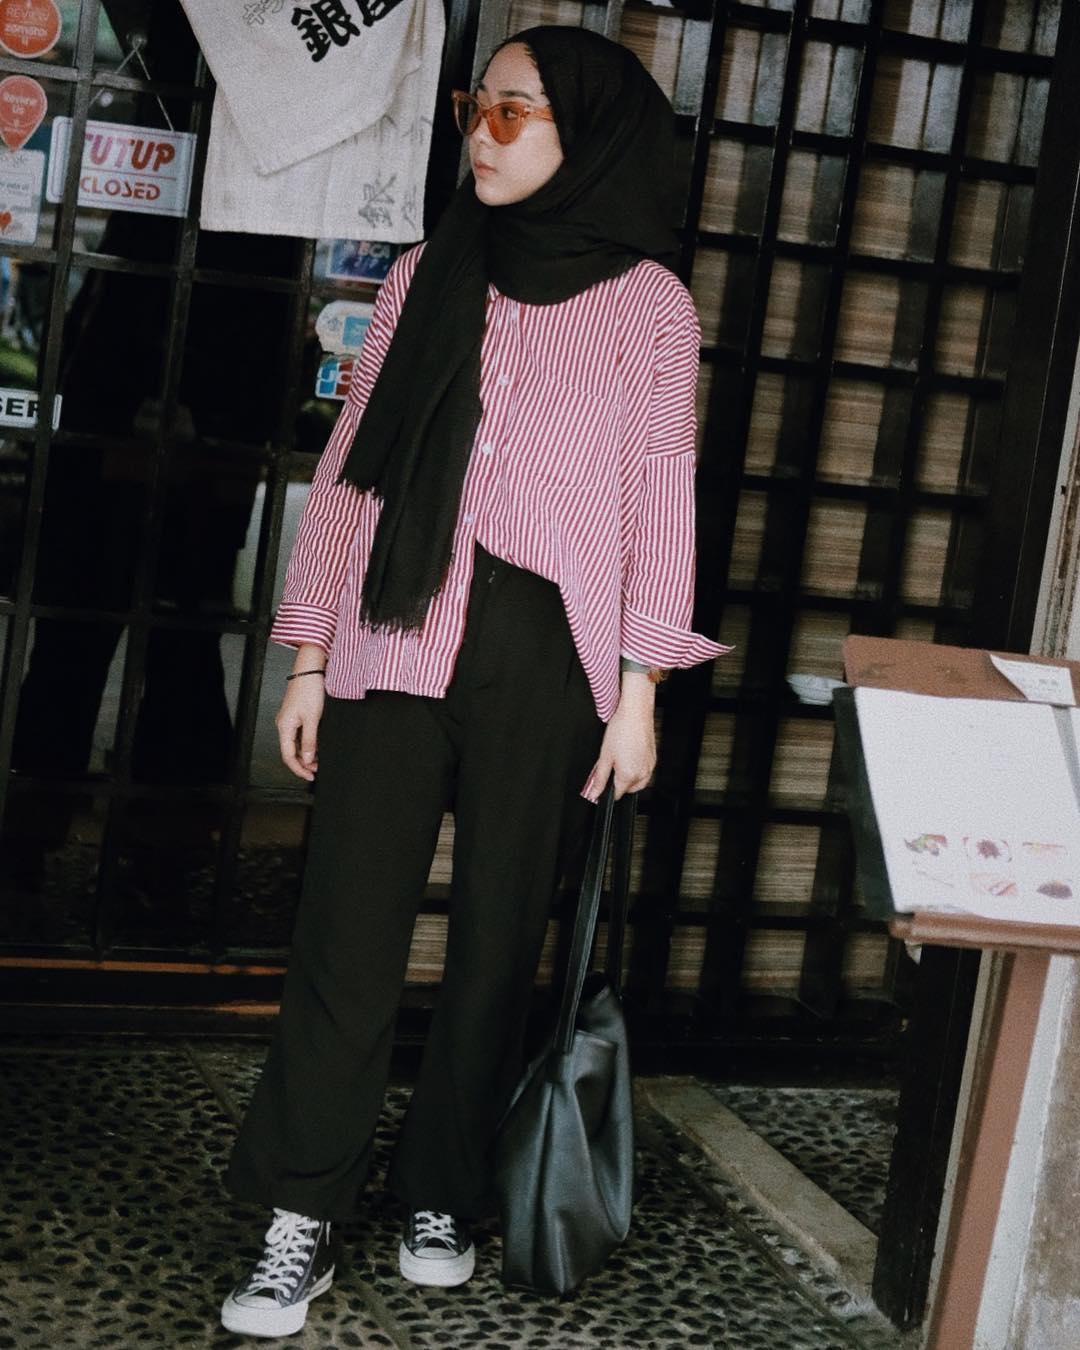 OOTD Baju Hijab Kekinian Ala Selebgram 2018 pashmina shawl square scarf longpants celana bahan cullotes tote clutch hand satchel bag sepatu kets sneakers hitam tshirt top kemeja stripe merah putih kacamata sunglasses bulat kuning gelang tangan outfit ootd selebgram 2018